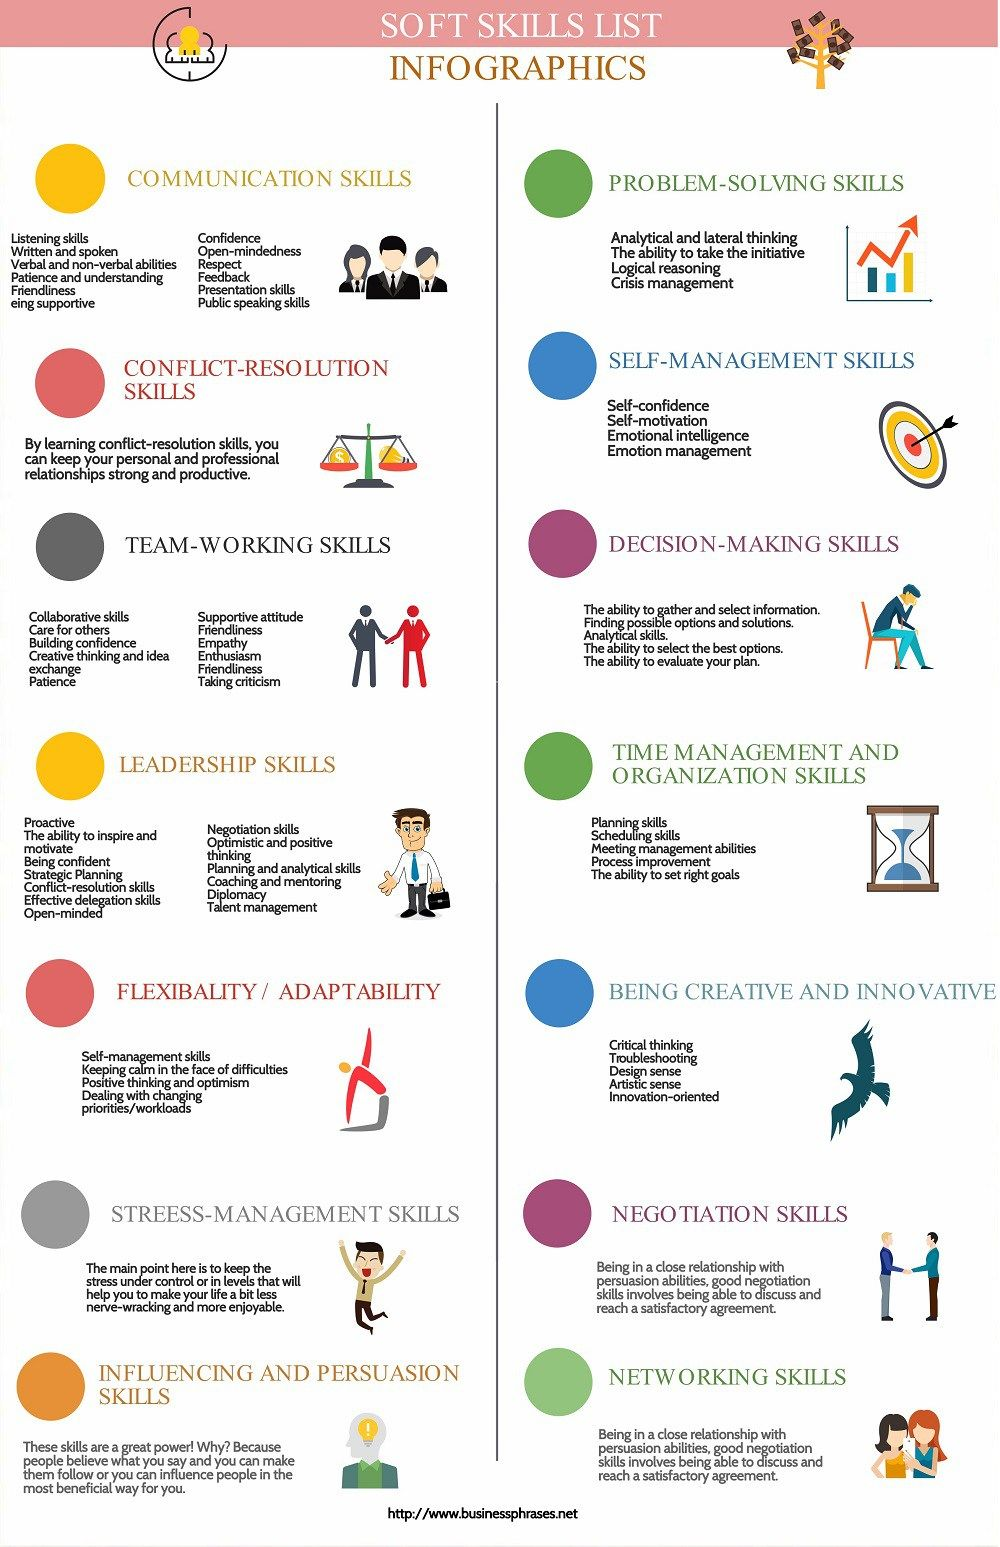 soft skills list infographic